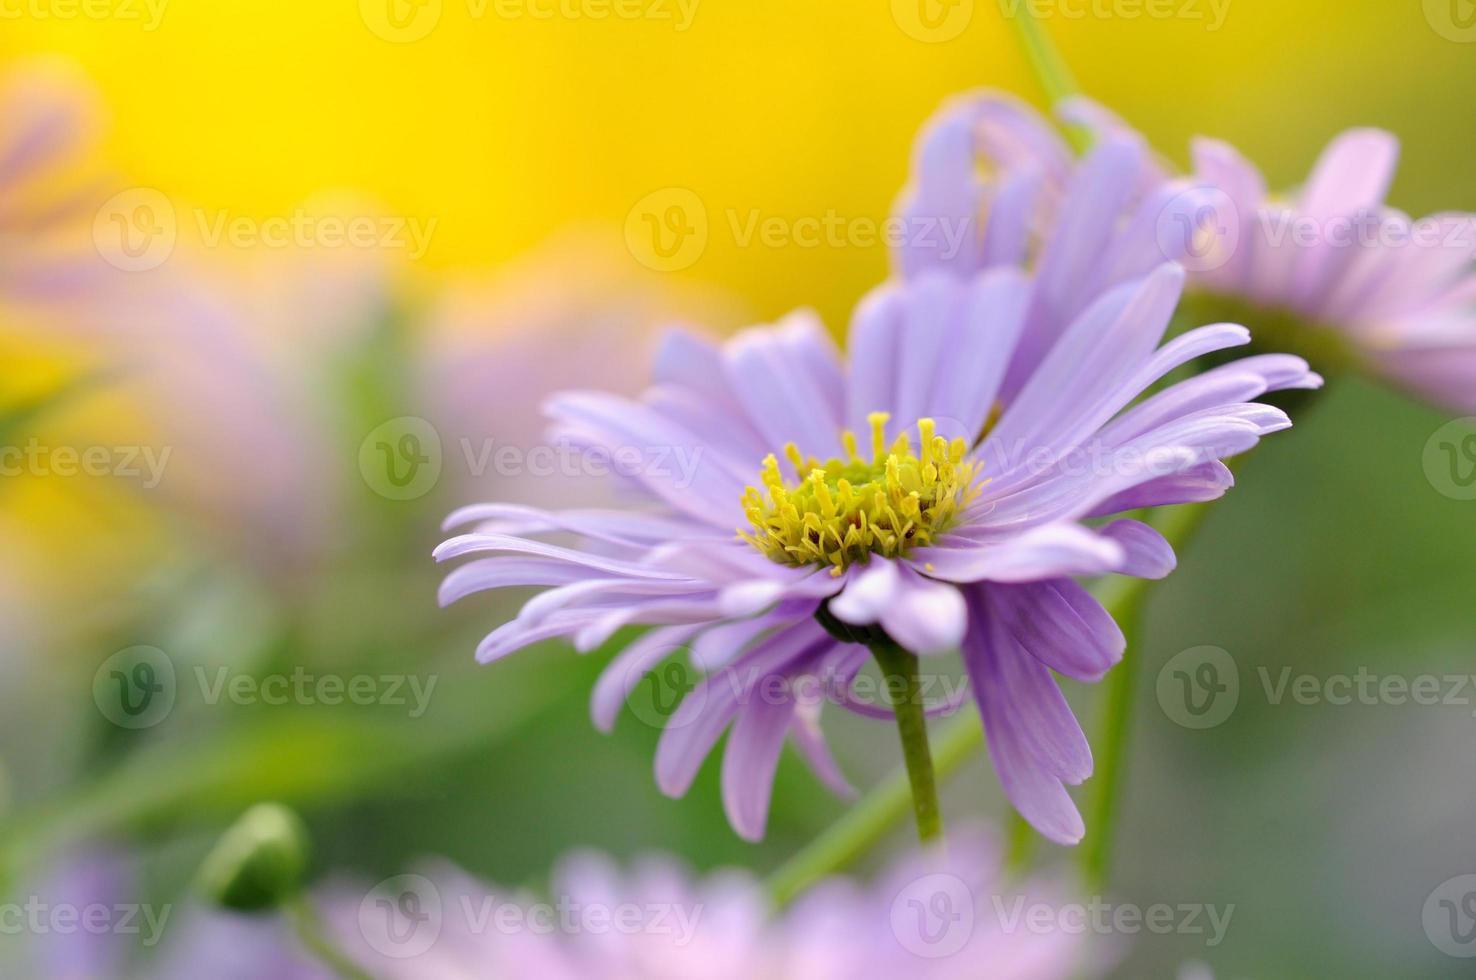 zwaan rivier daisy foto